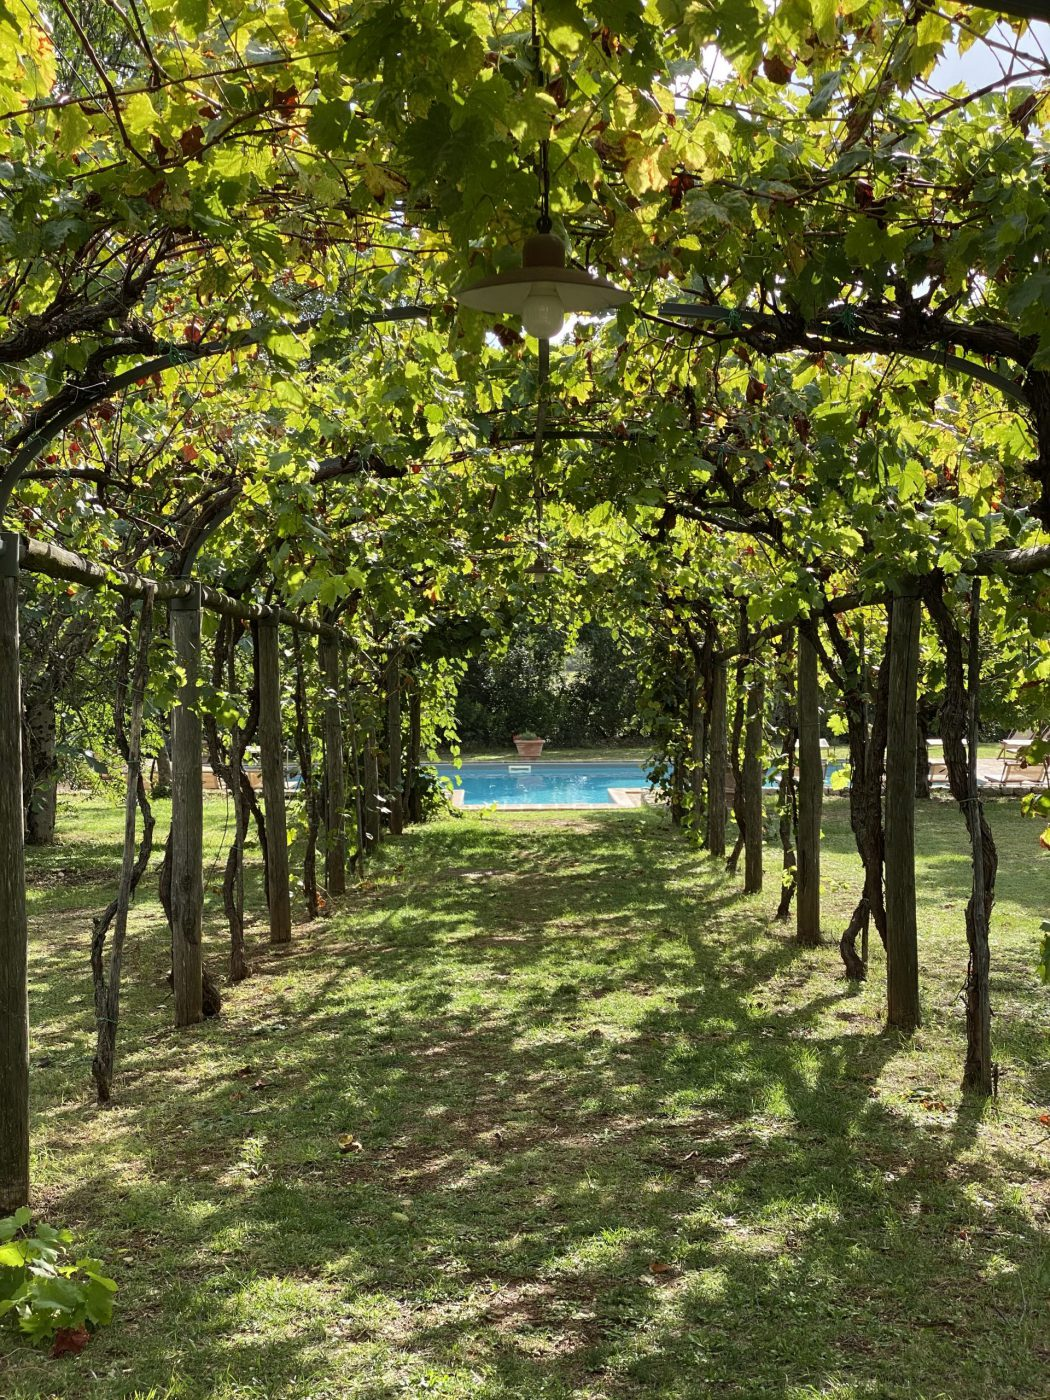 Countryside Lifestyle - Borgo della Marmotta Umbria